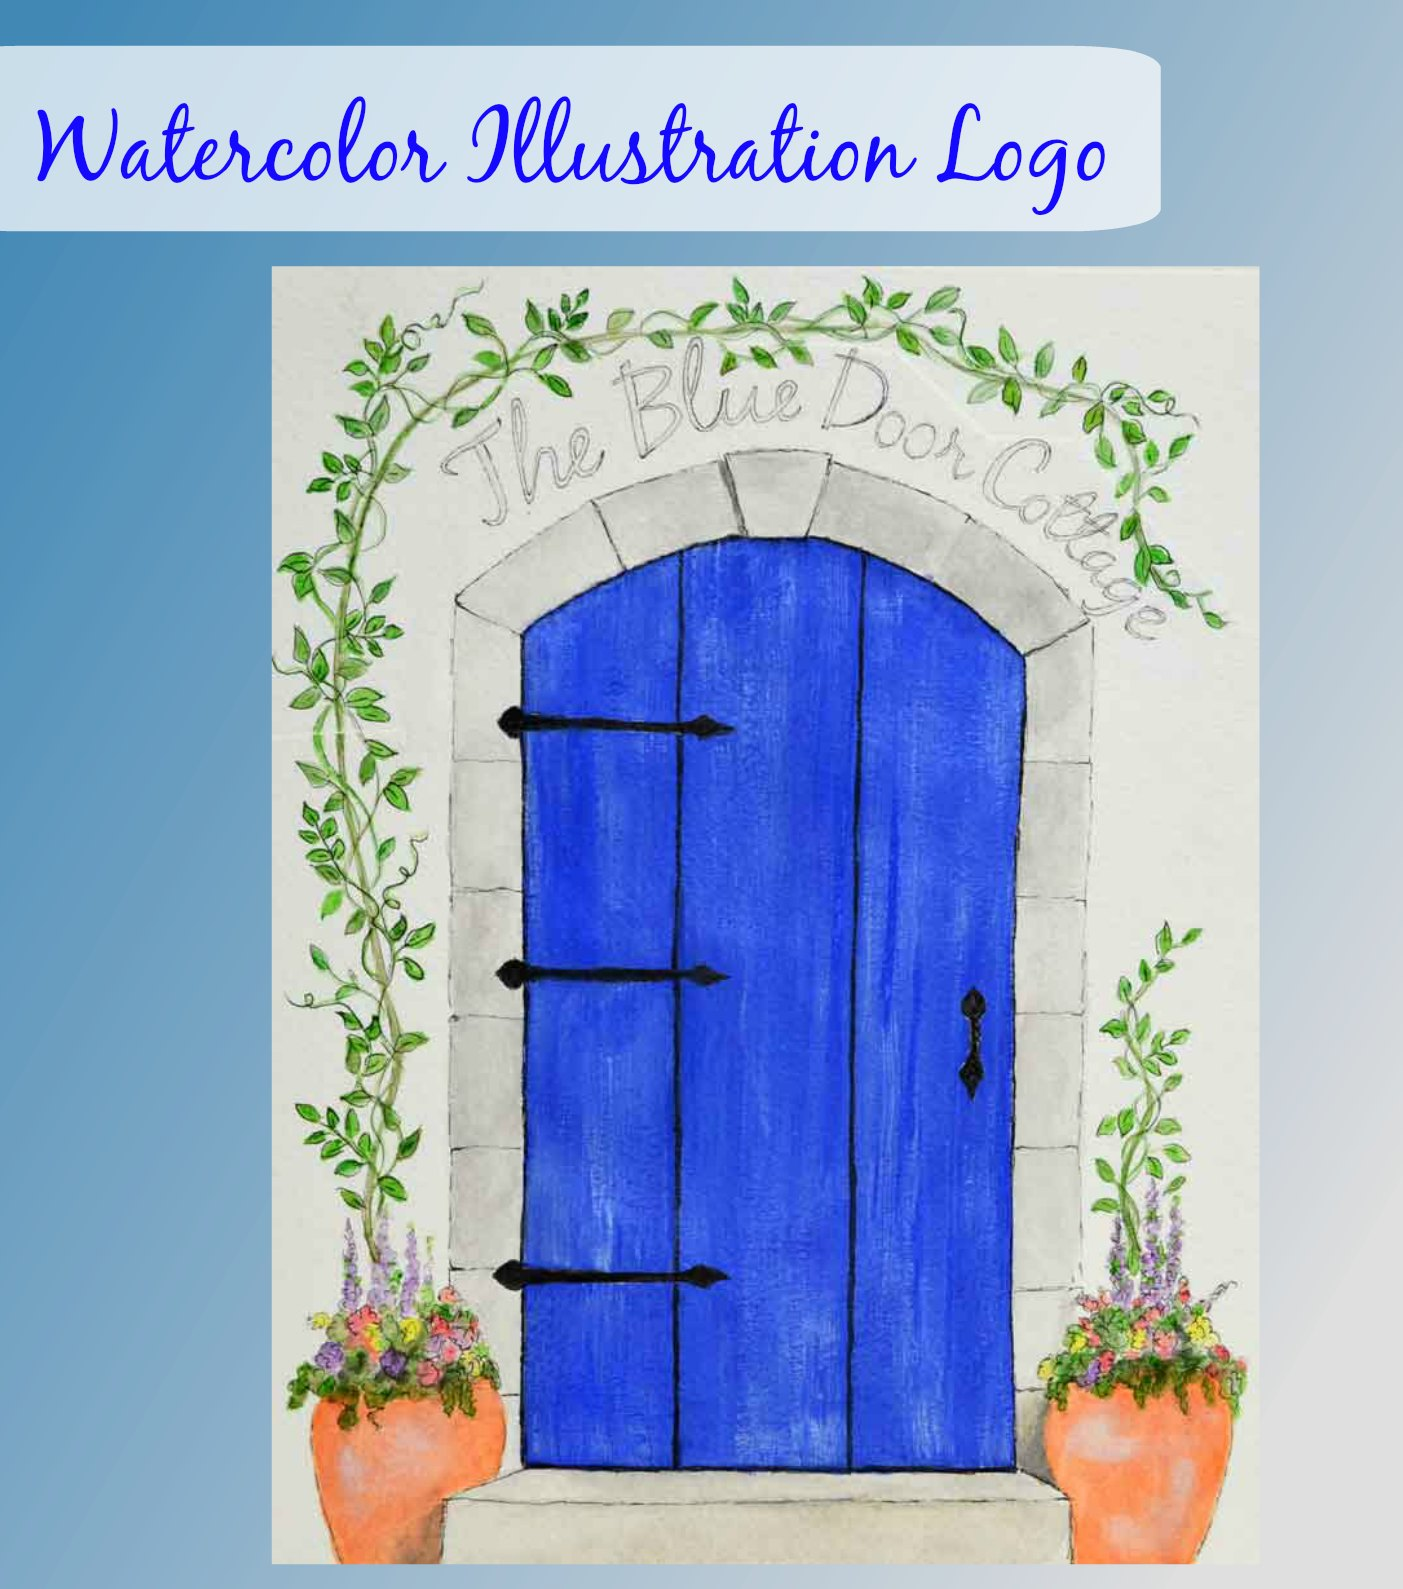 Watercolor Illustration Logo